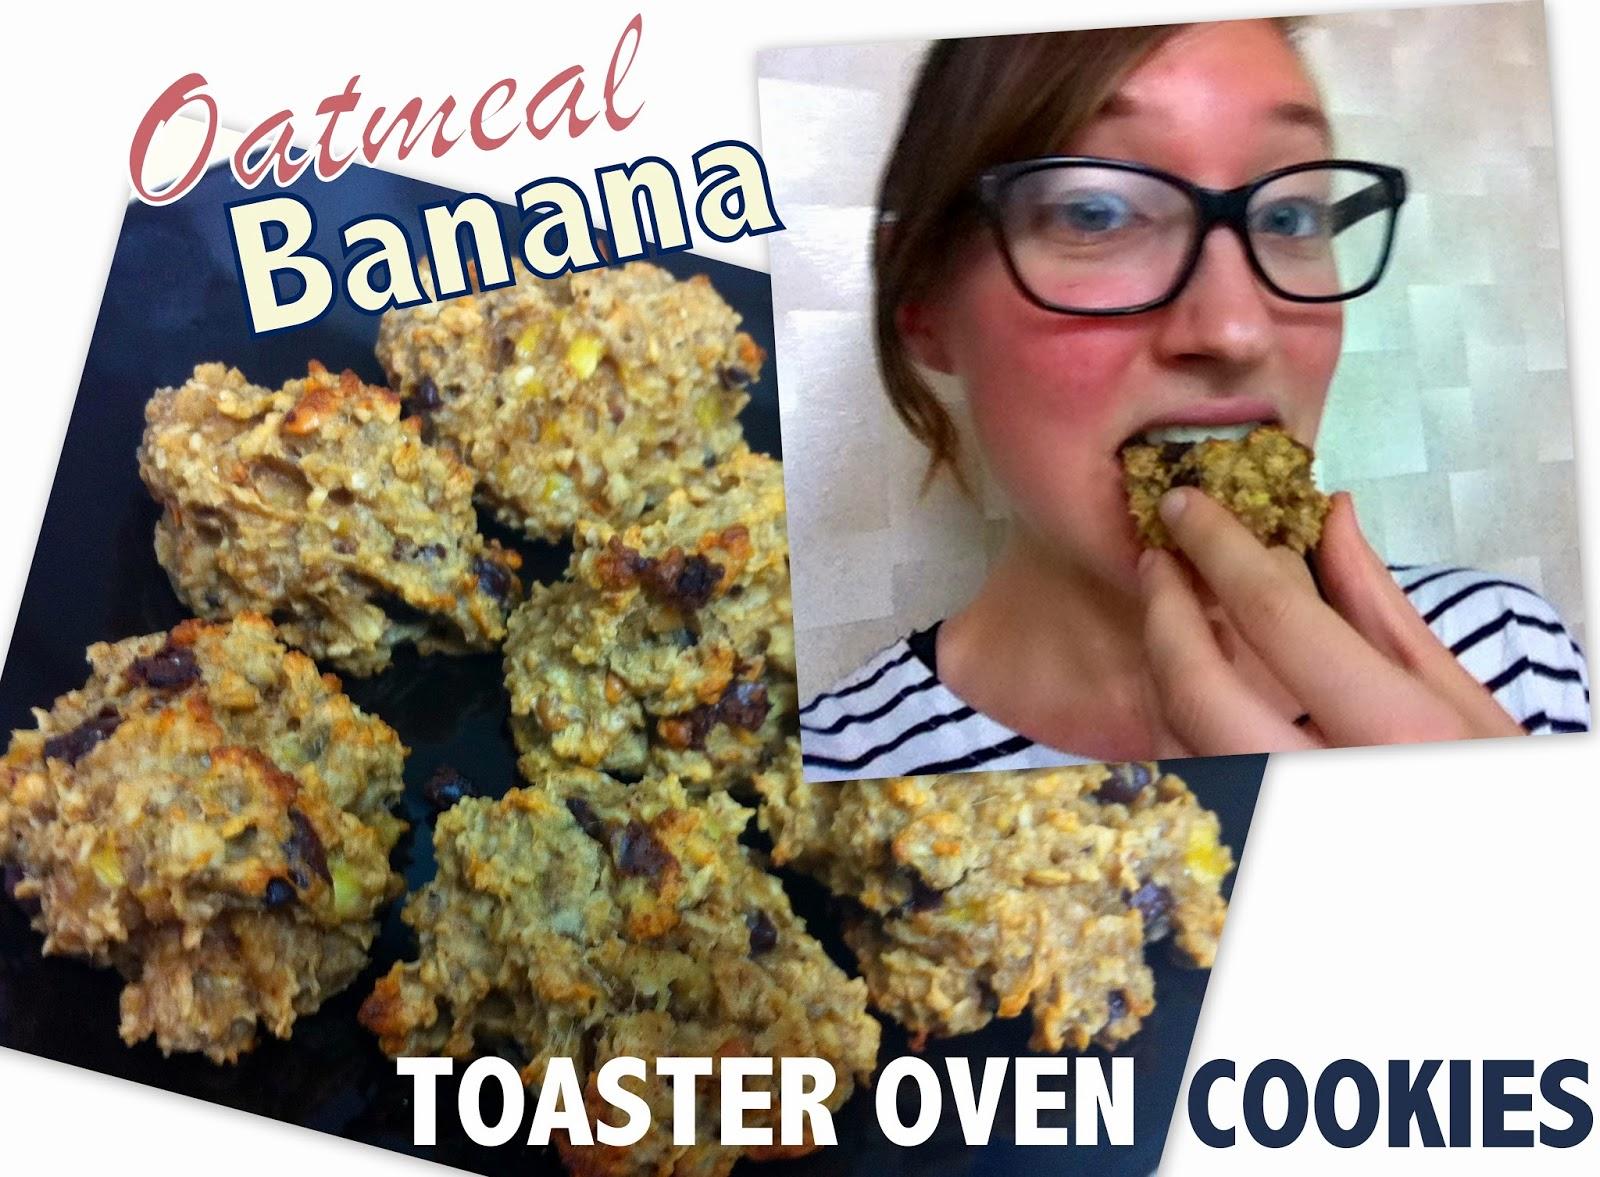 Oatmeal banana toaster oven cookies